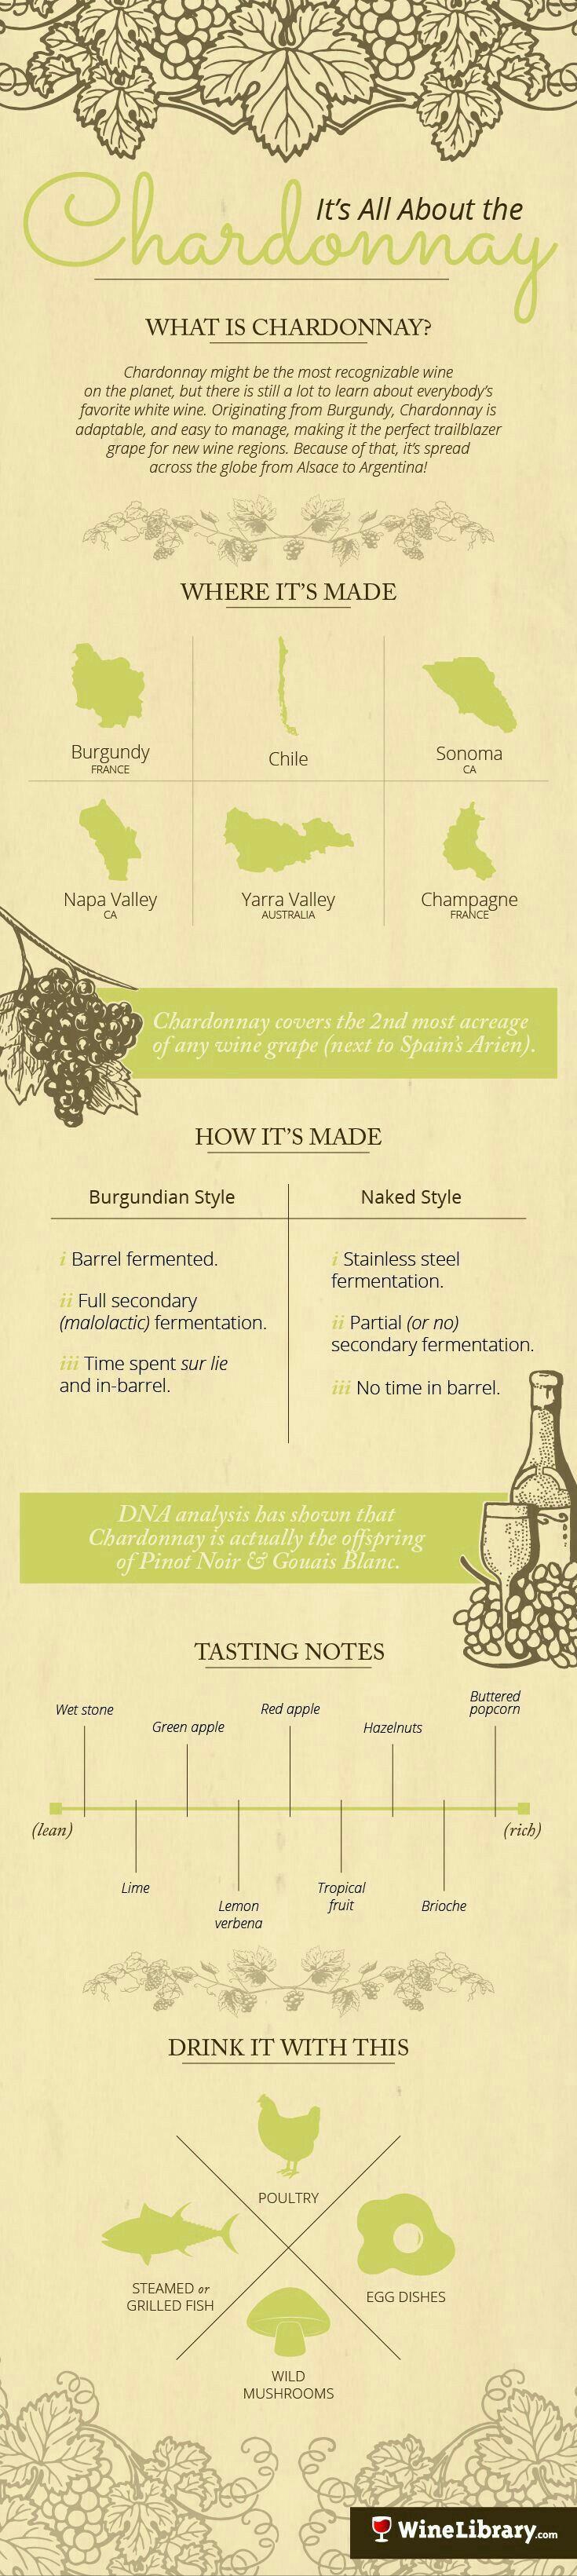 Chardonnay graphic